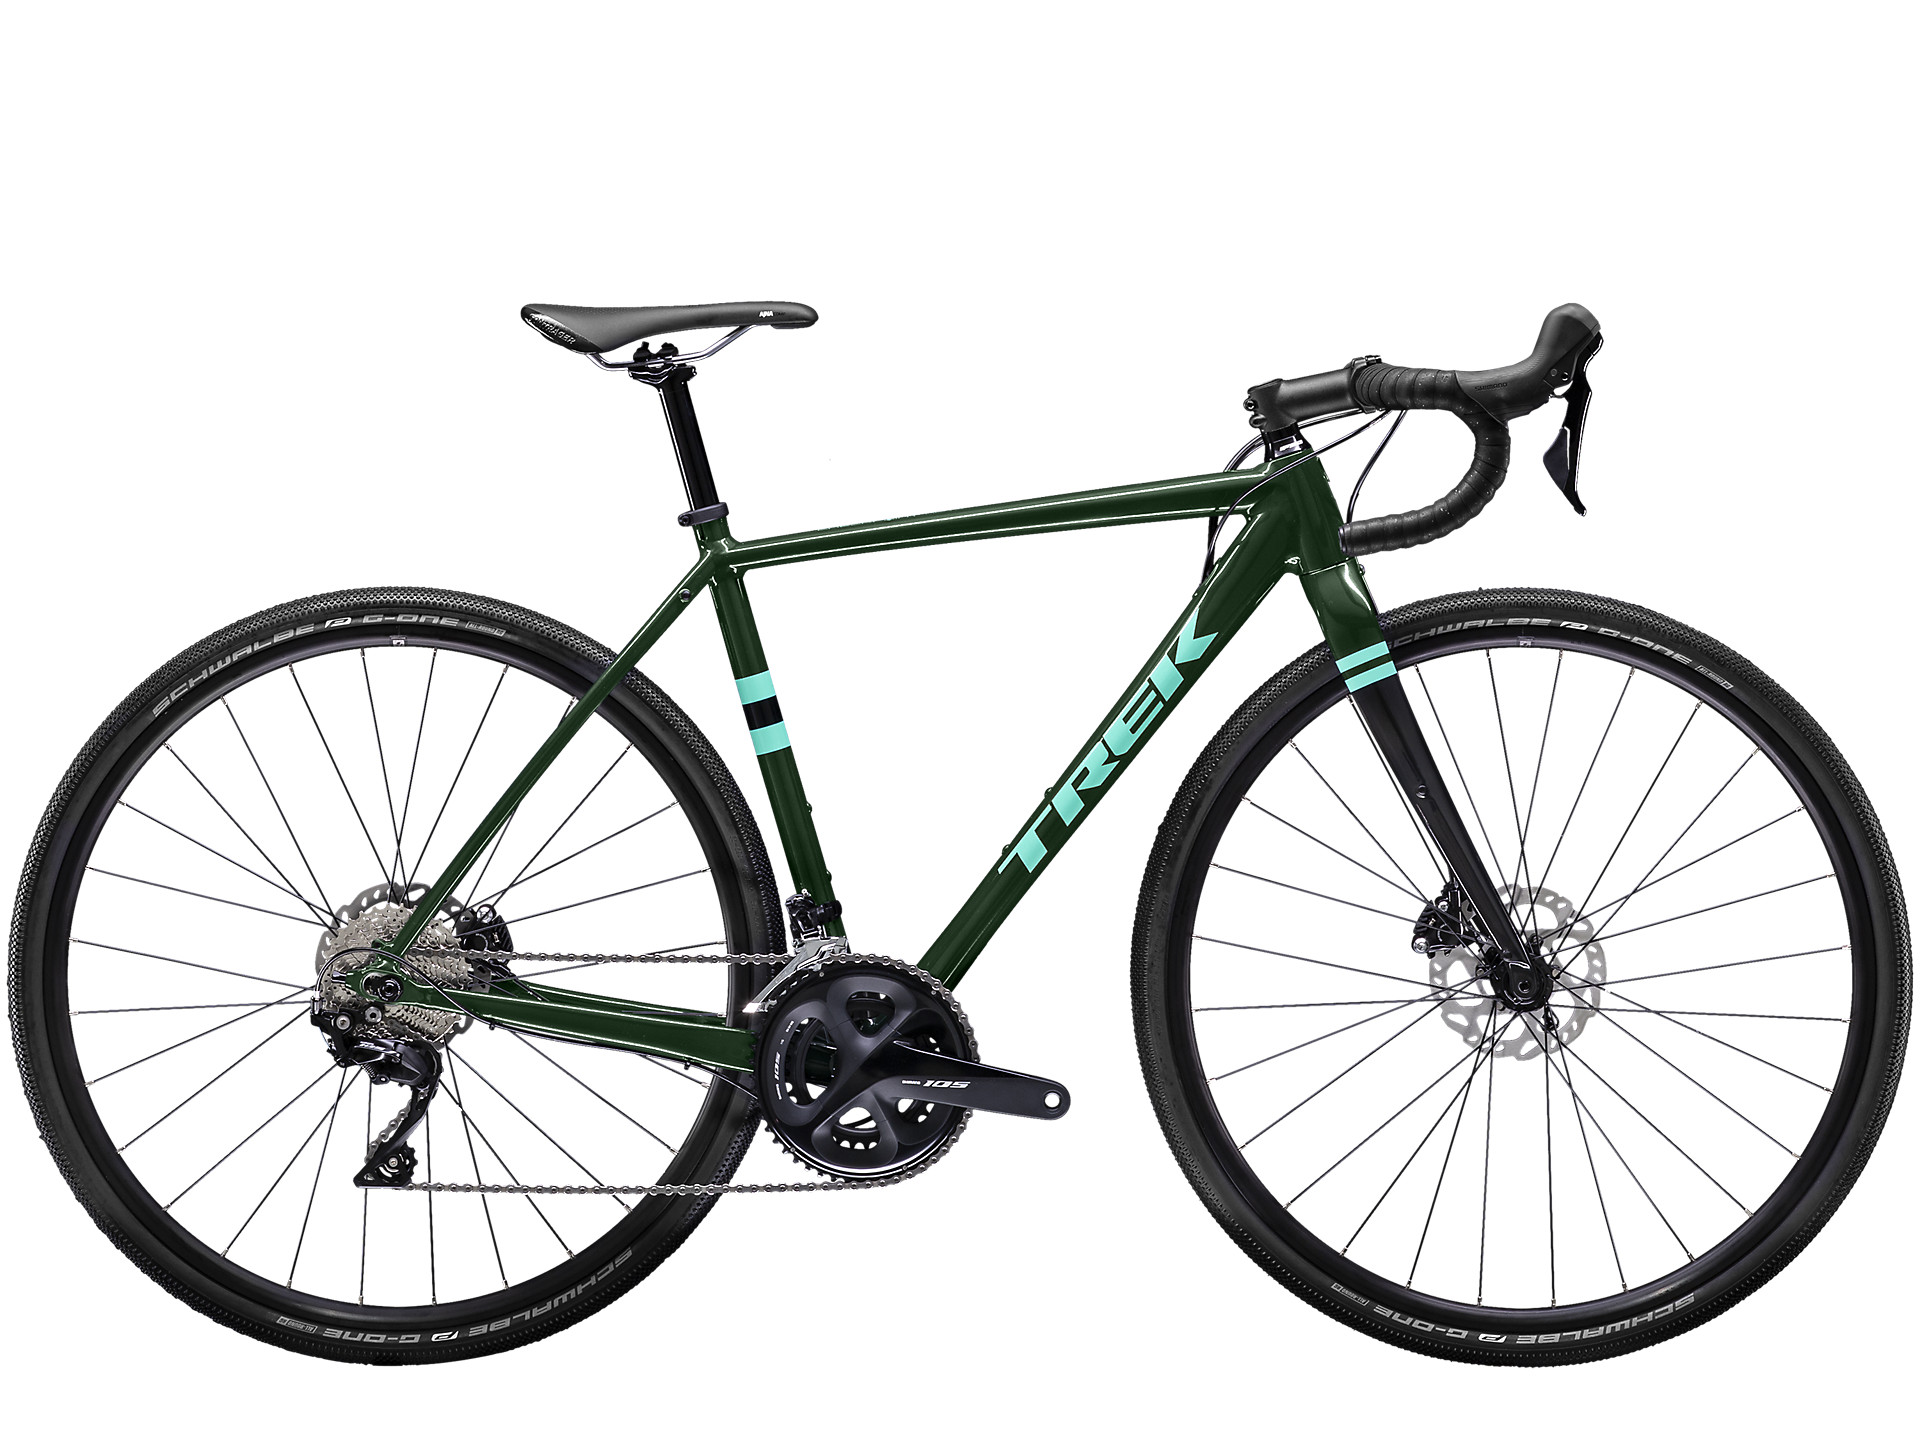 8a33bbd6d37 Checkpoint ALR 5 | Trek Bikes